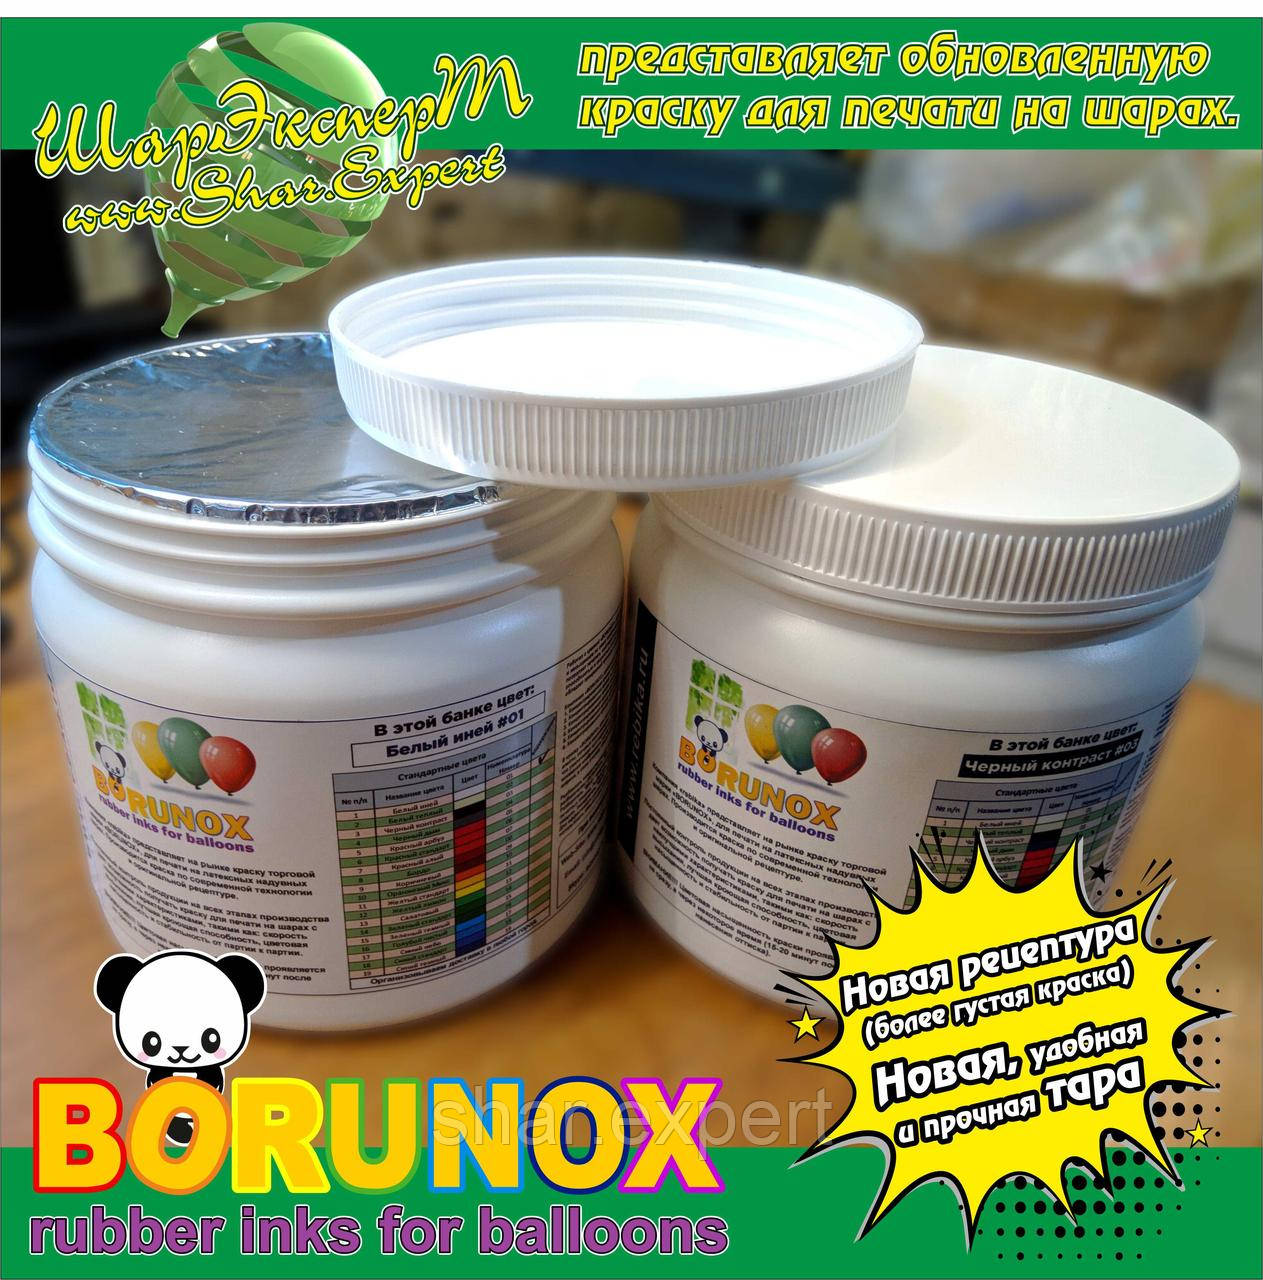 Концентрированная краска BORUNOX для печати на надувных шарах (металлик, перламутр)